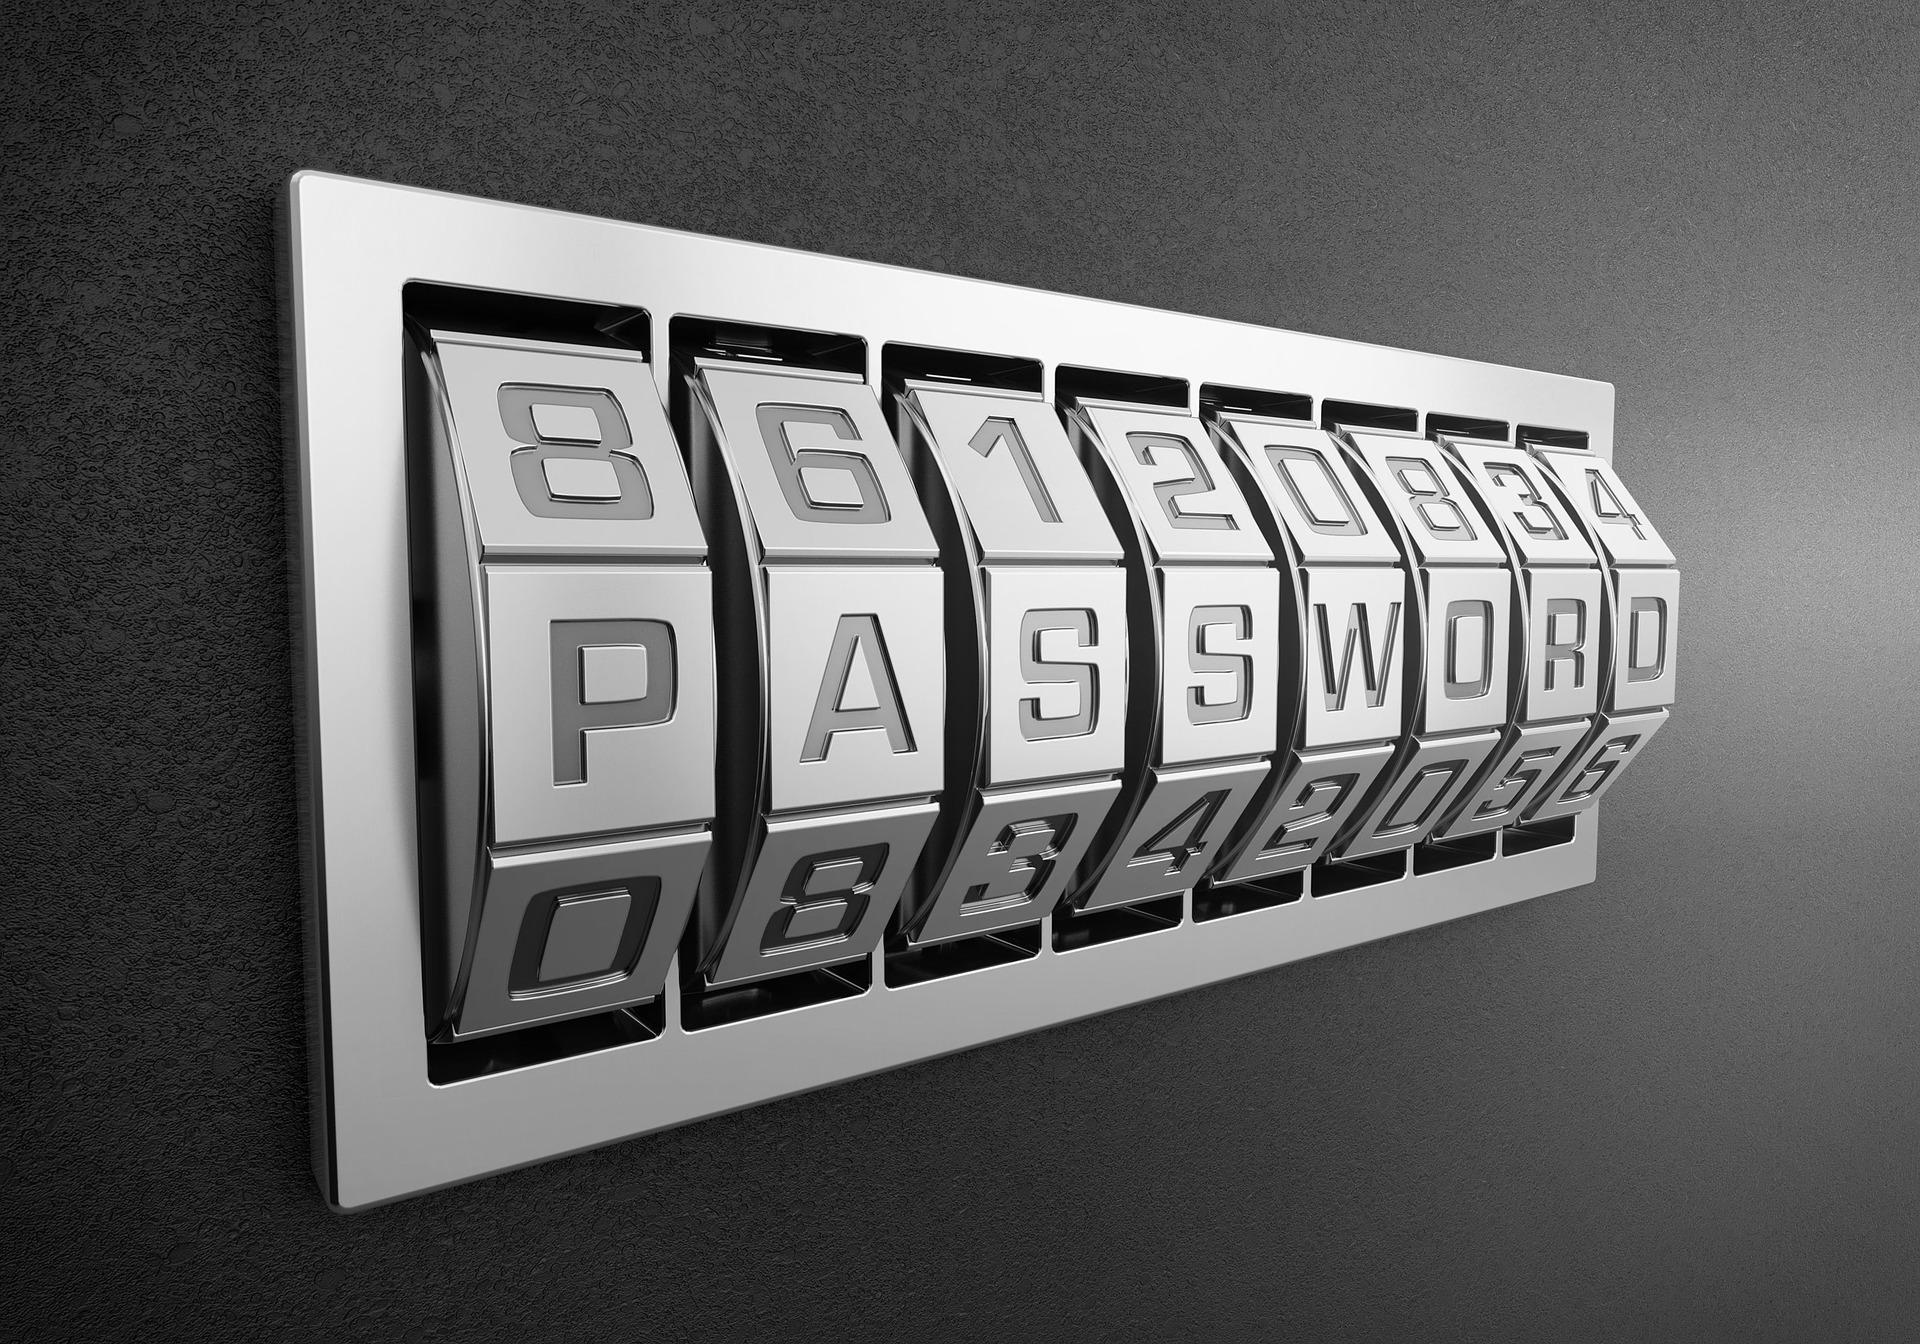 Building a basic admin panel using Laravel (1) - Authentication